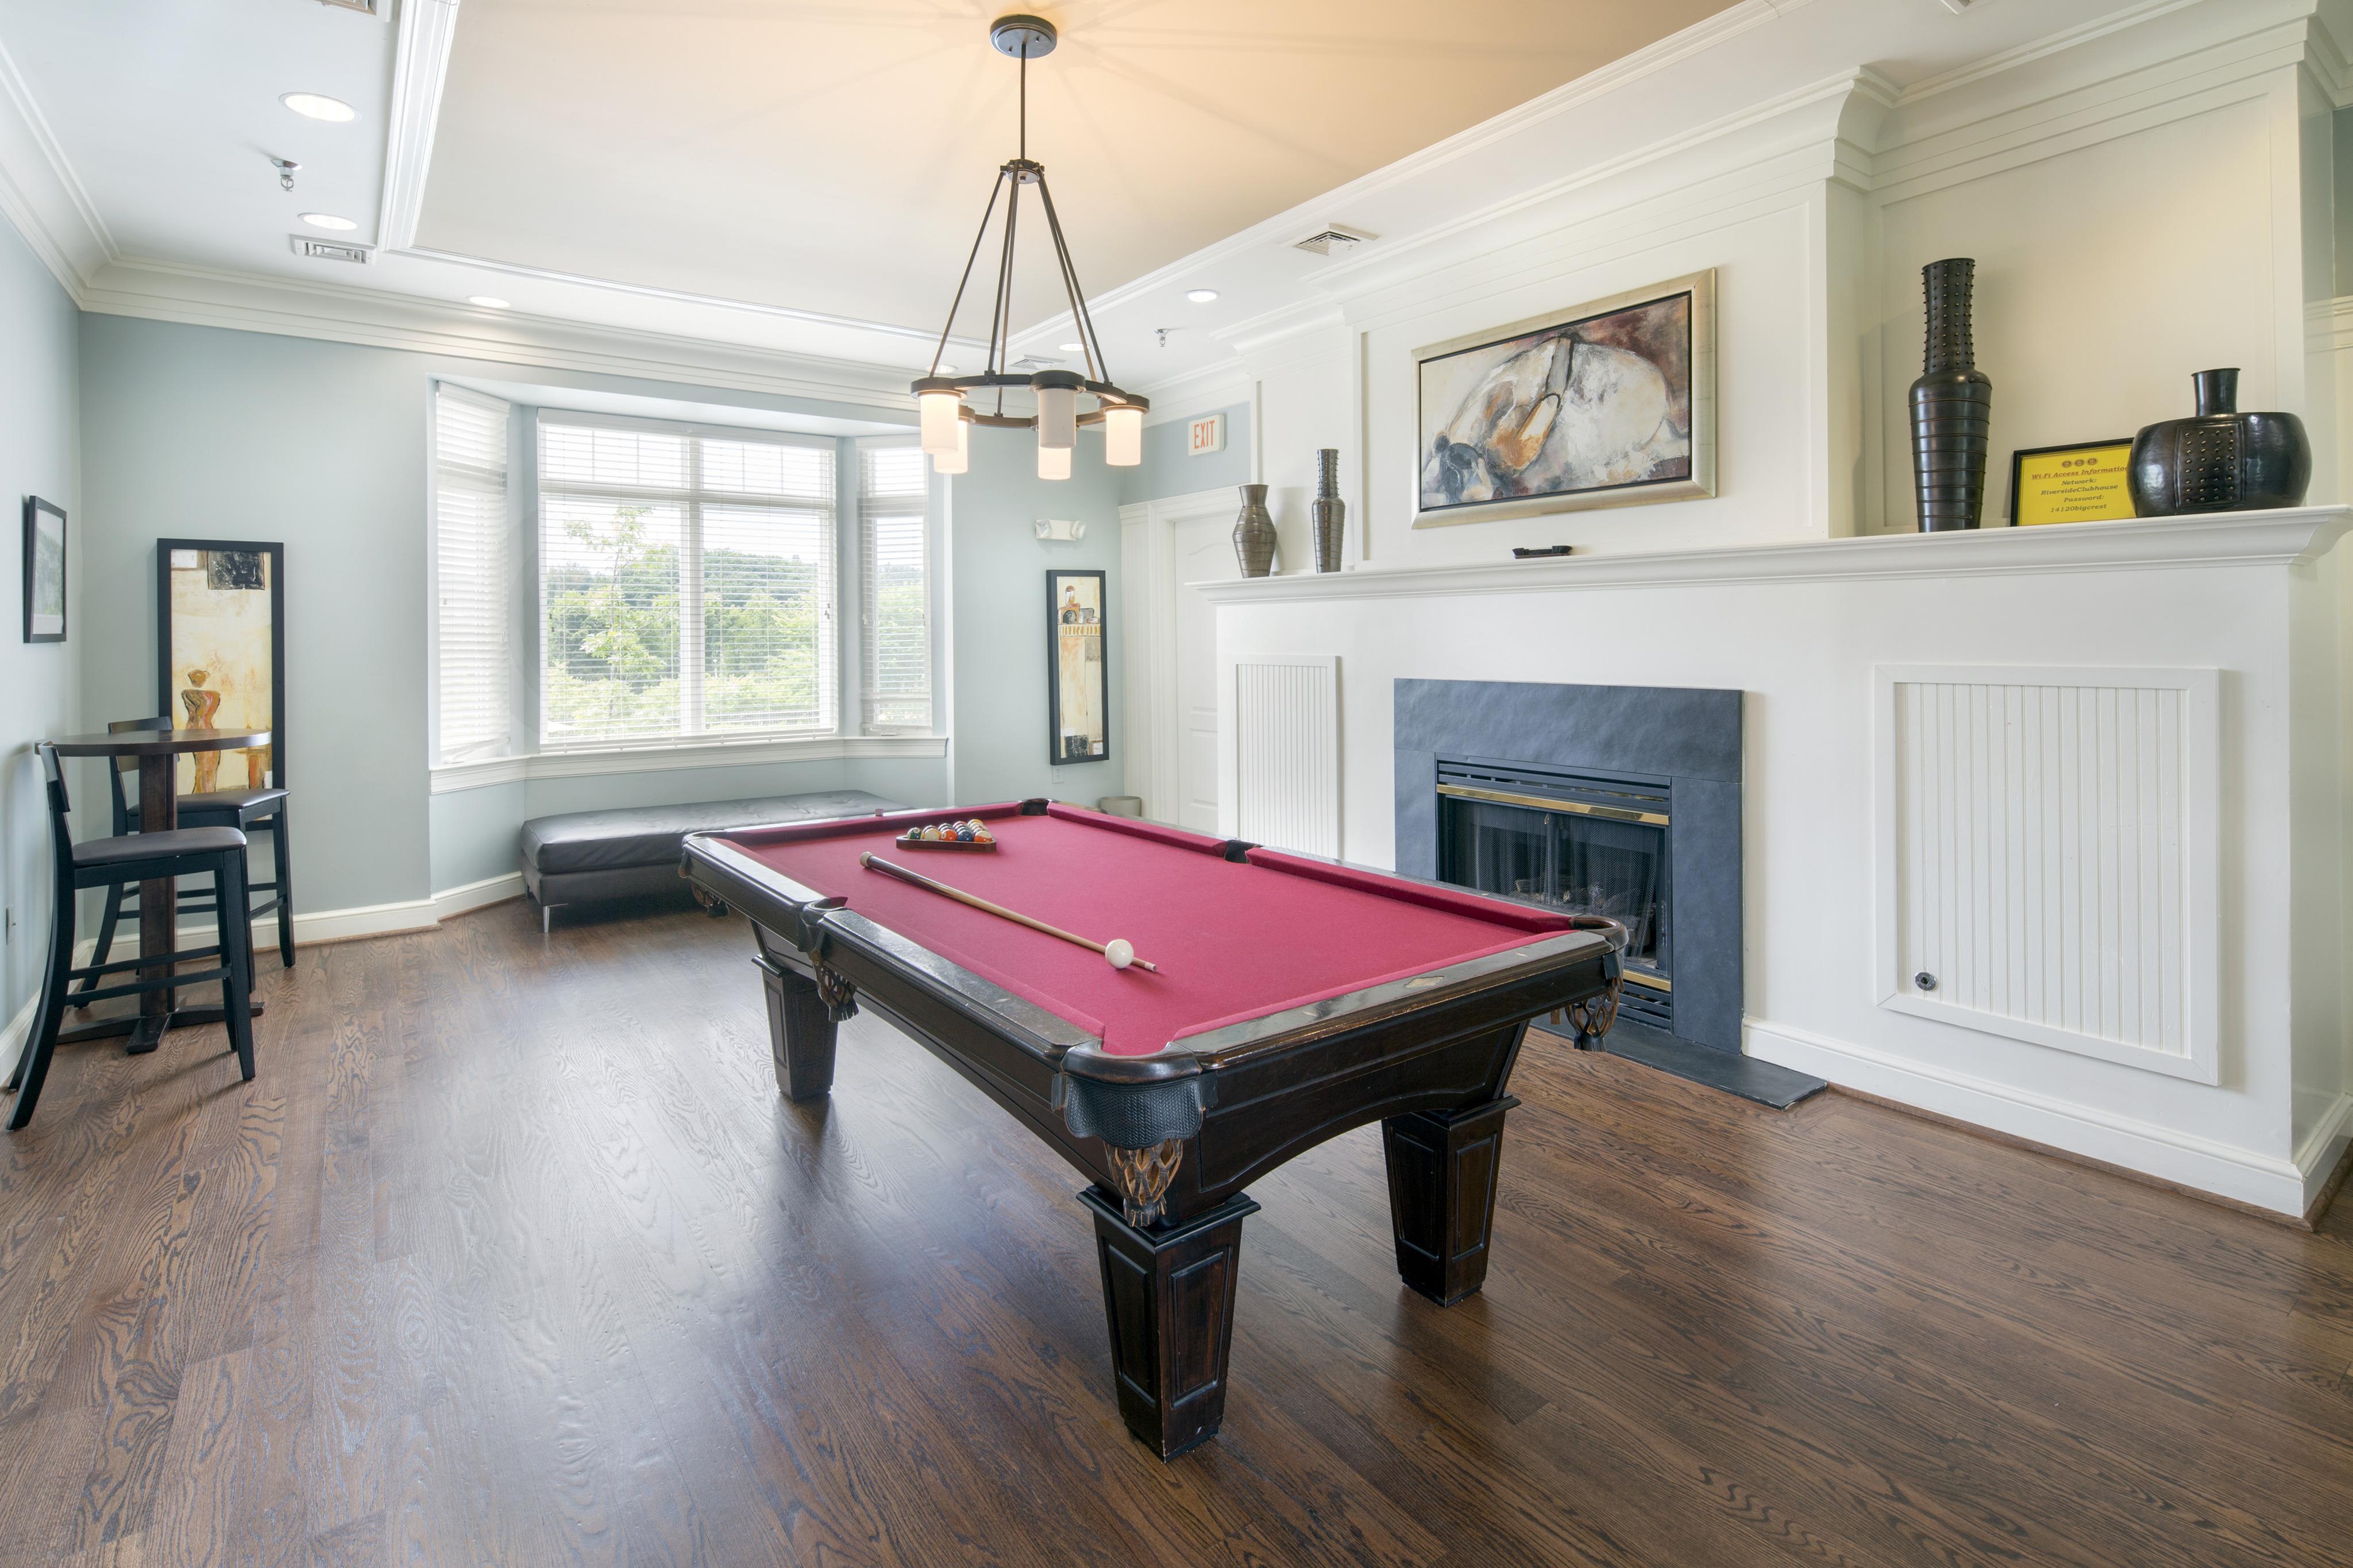 Billiards table at Riverside Station Apartments in Woodbridge, VA